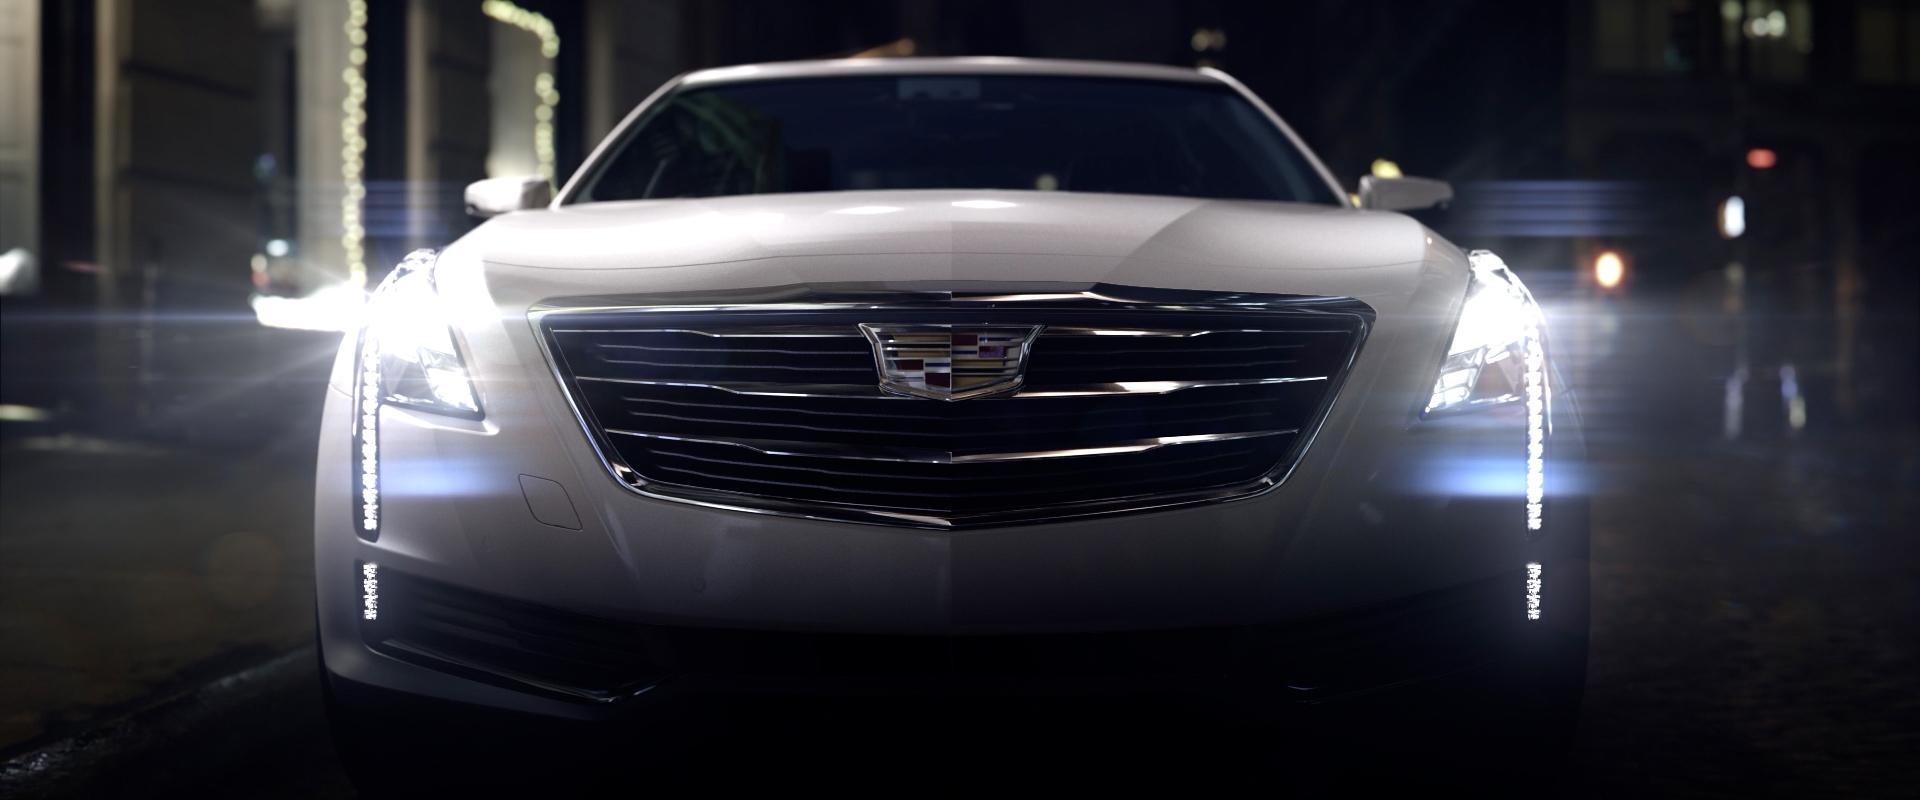 Cadillac_CT6_Lights_HD.jpg